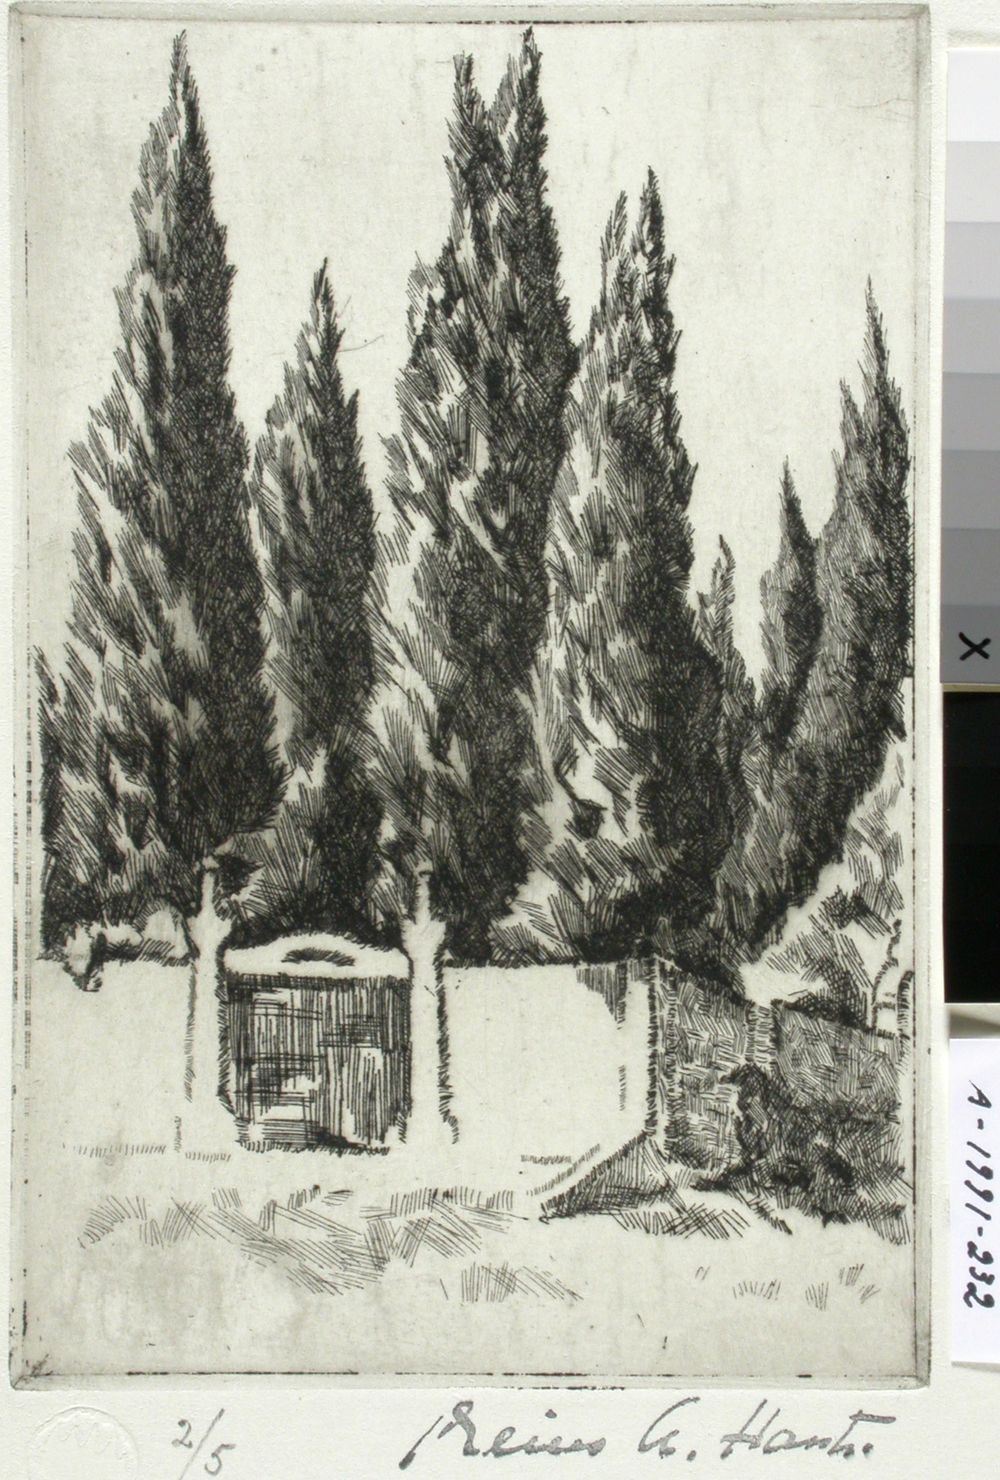 Sypressejä (Firenze)